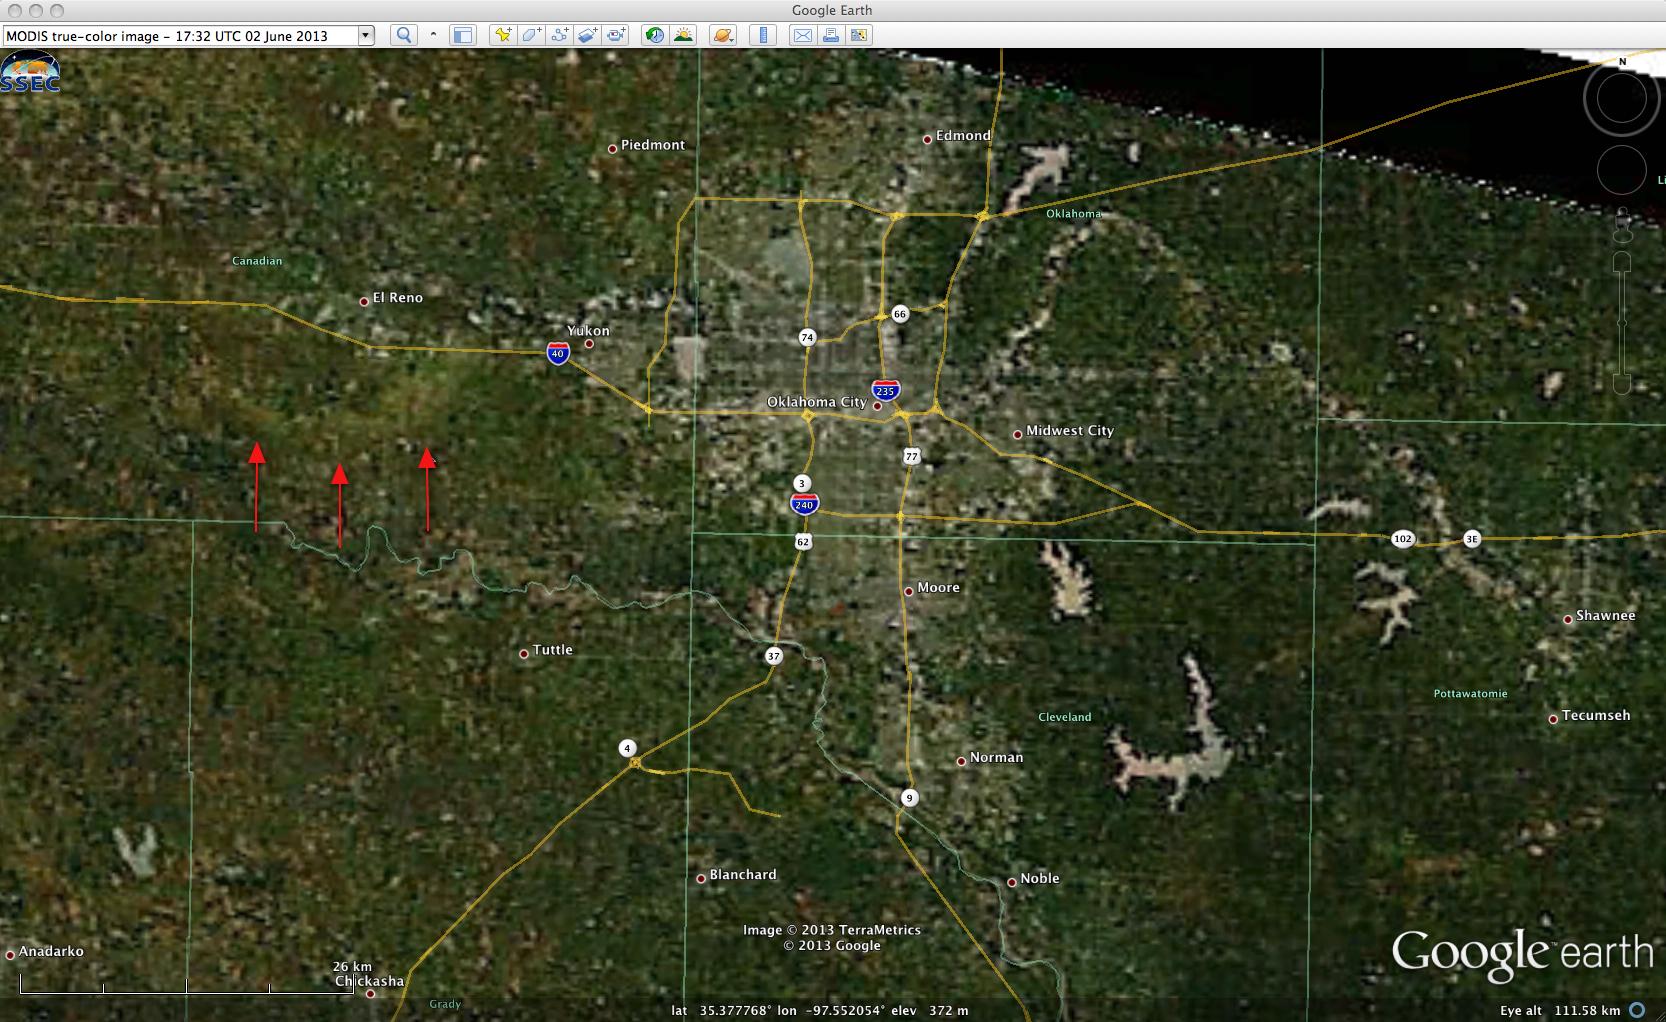 MODIS true-color RGB image (viewed using Google Earth)